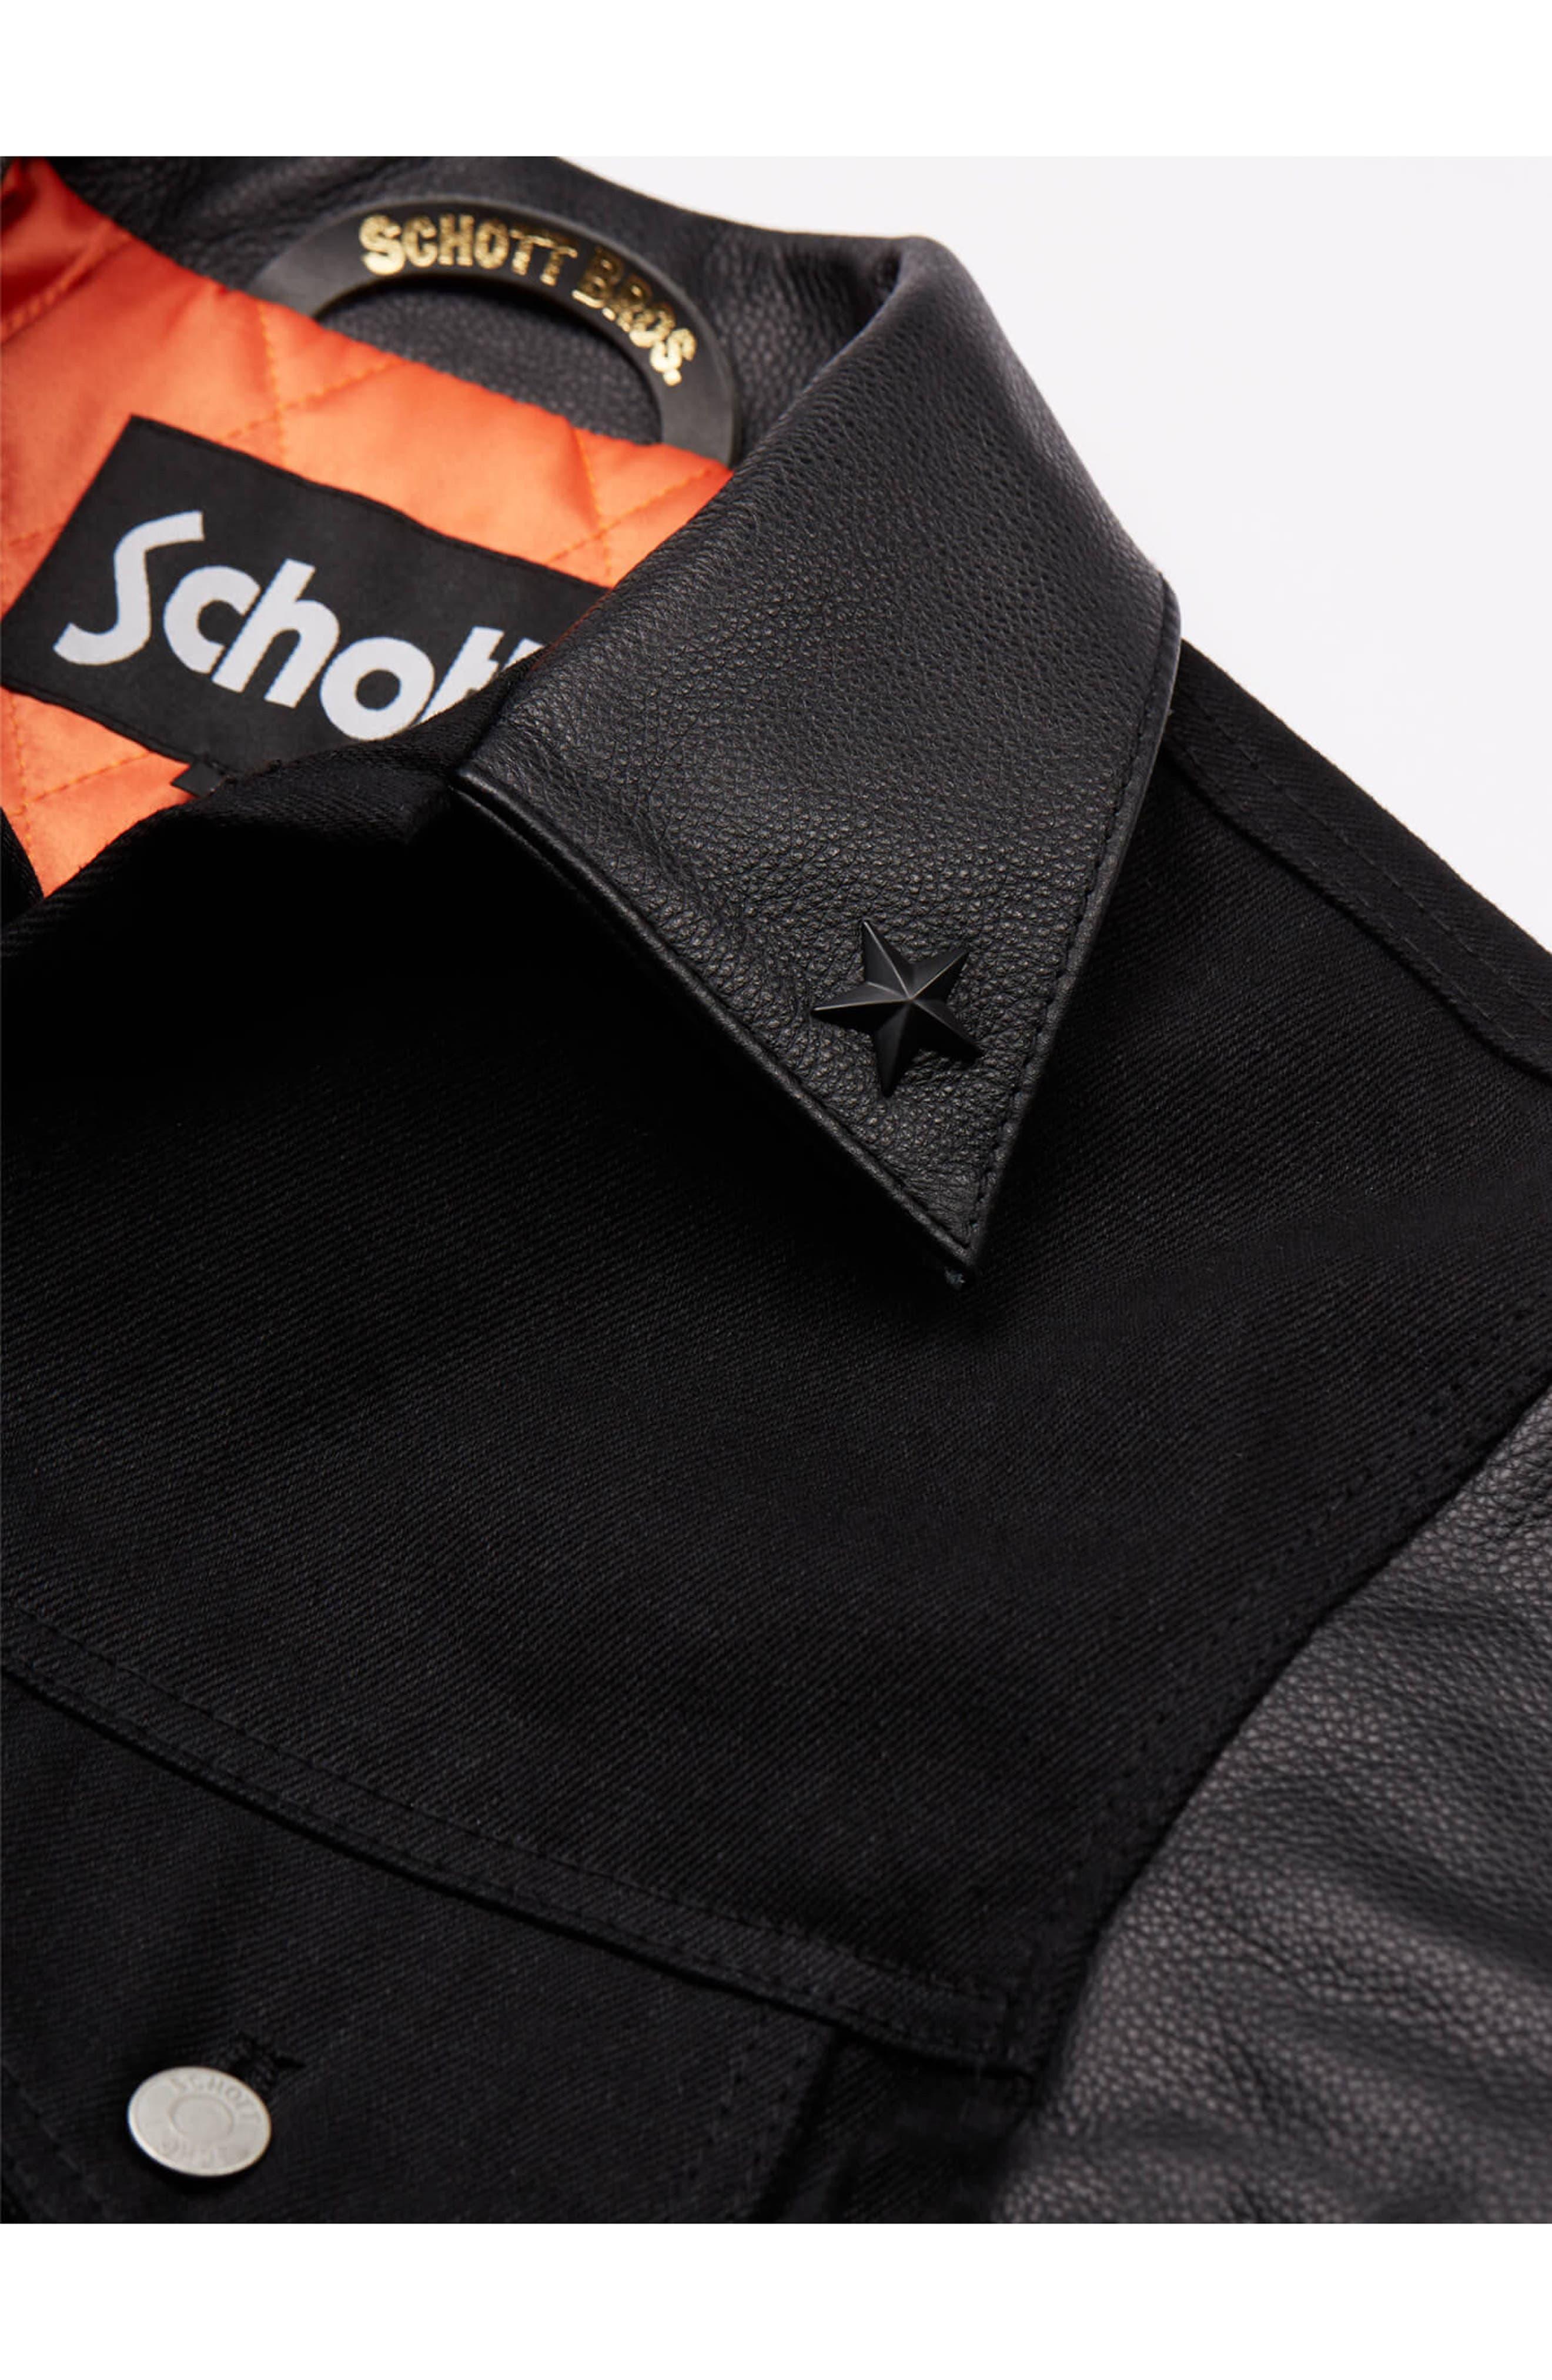 x Schott Denim Jacket,                             Alternate thumbnail 3, color,                             Black